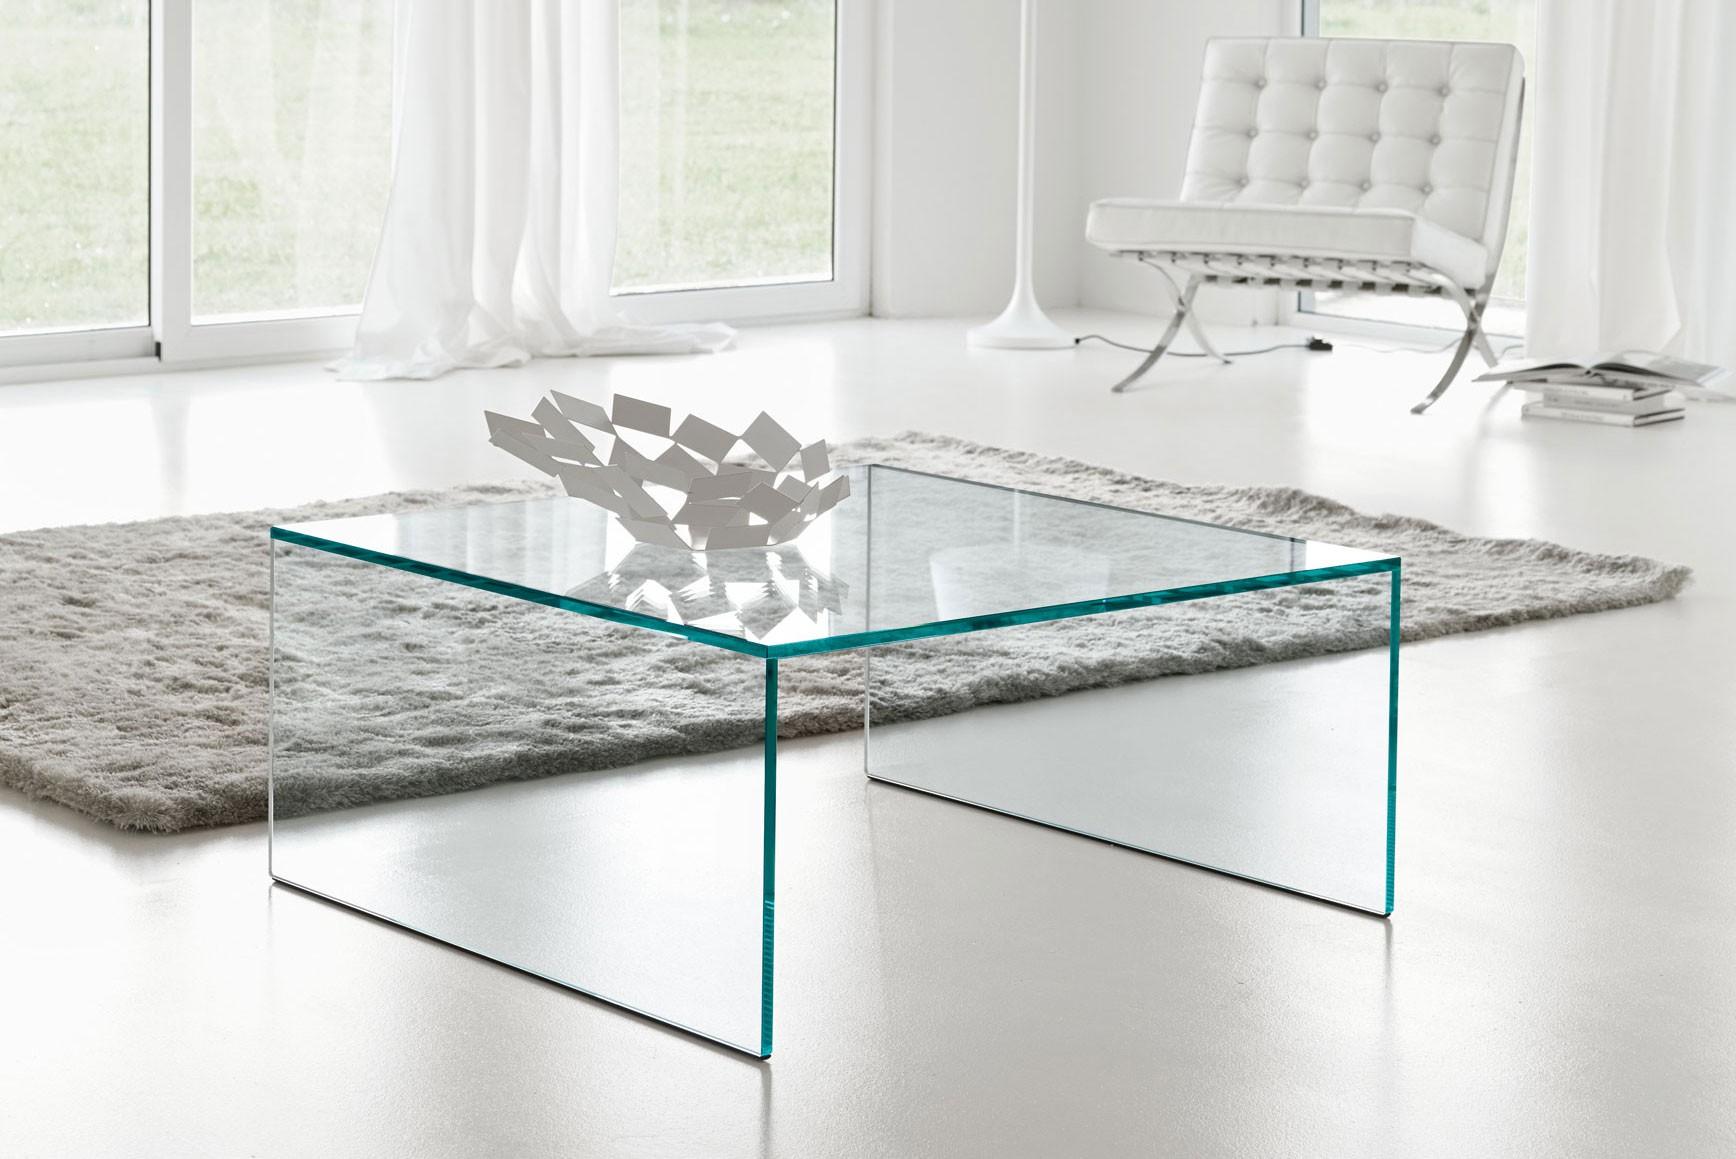 Glazen Design Tafeltje.Glazen Salontafel Vidre Glastoepassingen